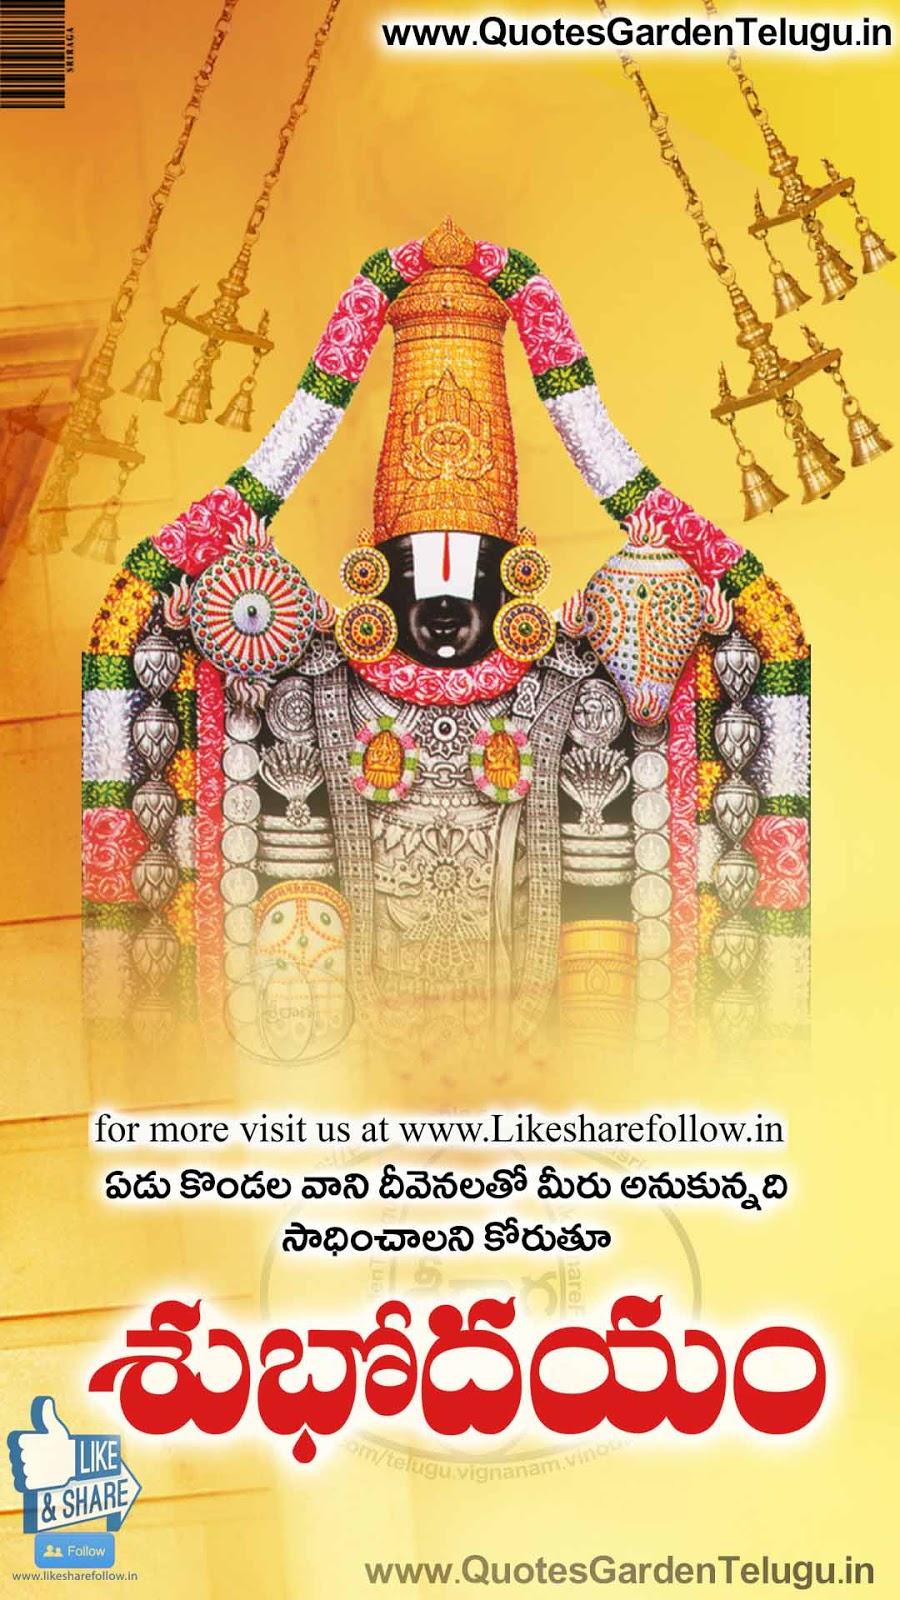 Popular Wallpaper Lord Good Morning - Telugu%2BGood%2Bmorning%2BWallpapers%2Bwith%2BLord%2BVenkateswaraswami  Trends_463459.jpg